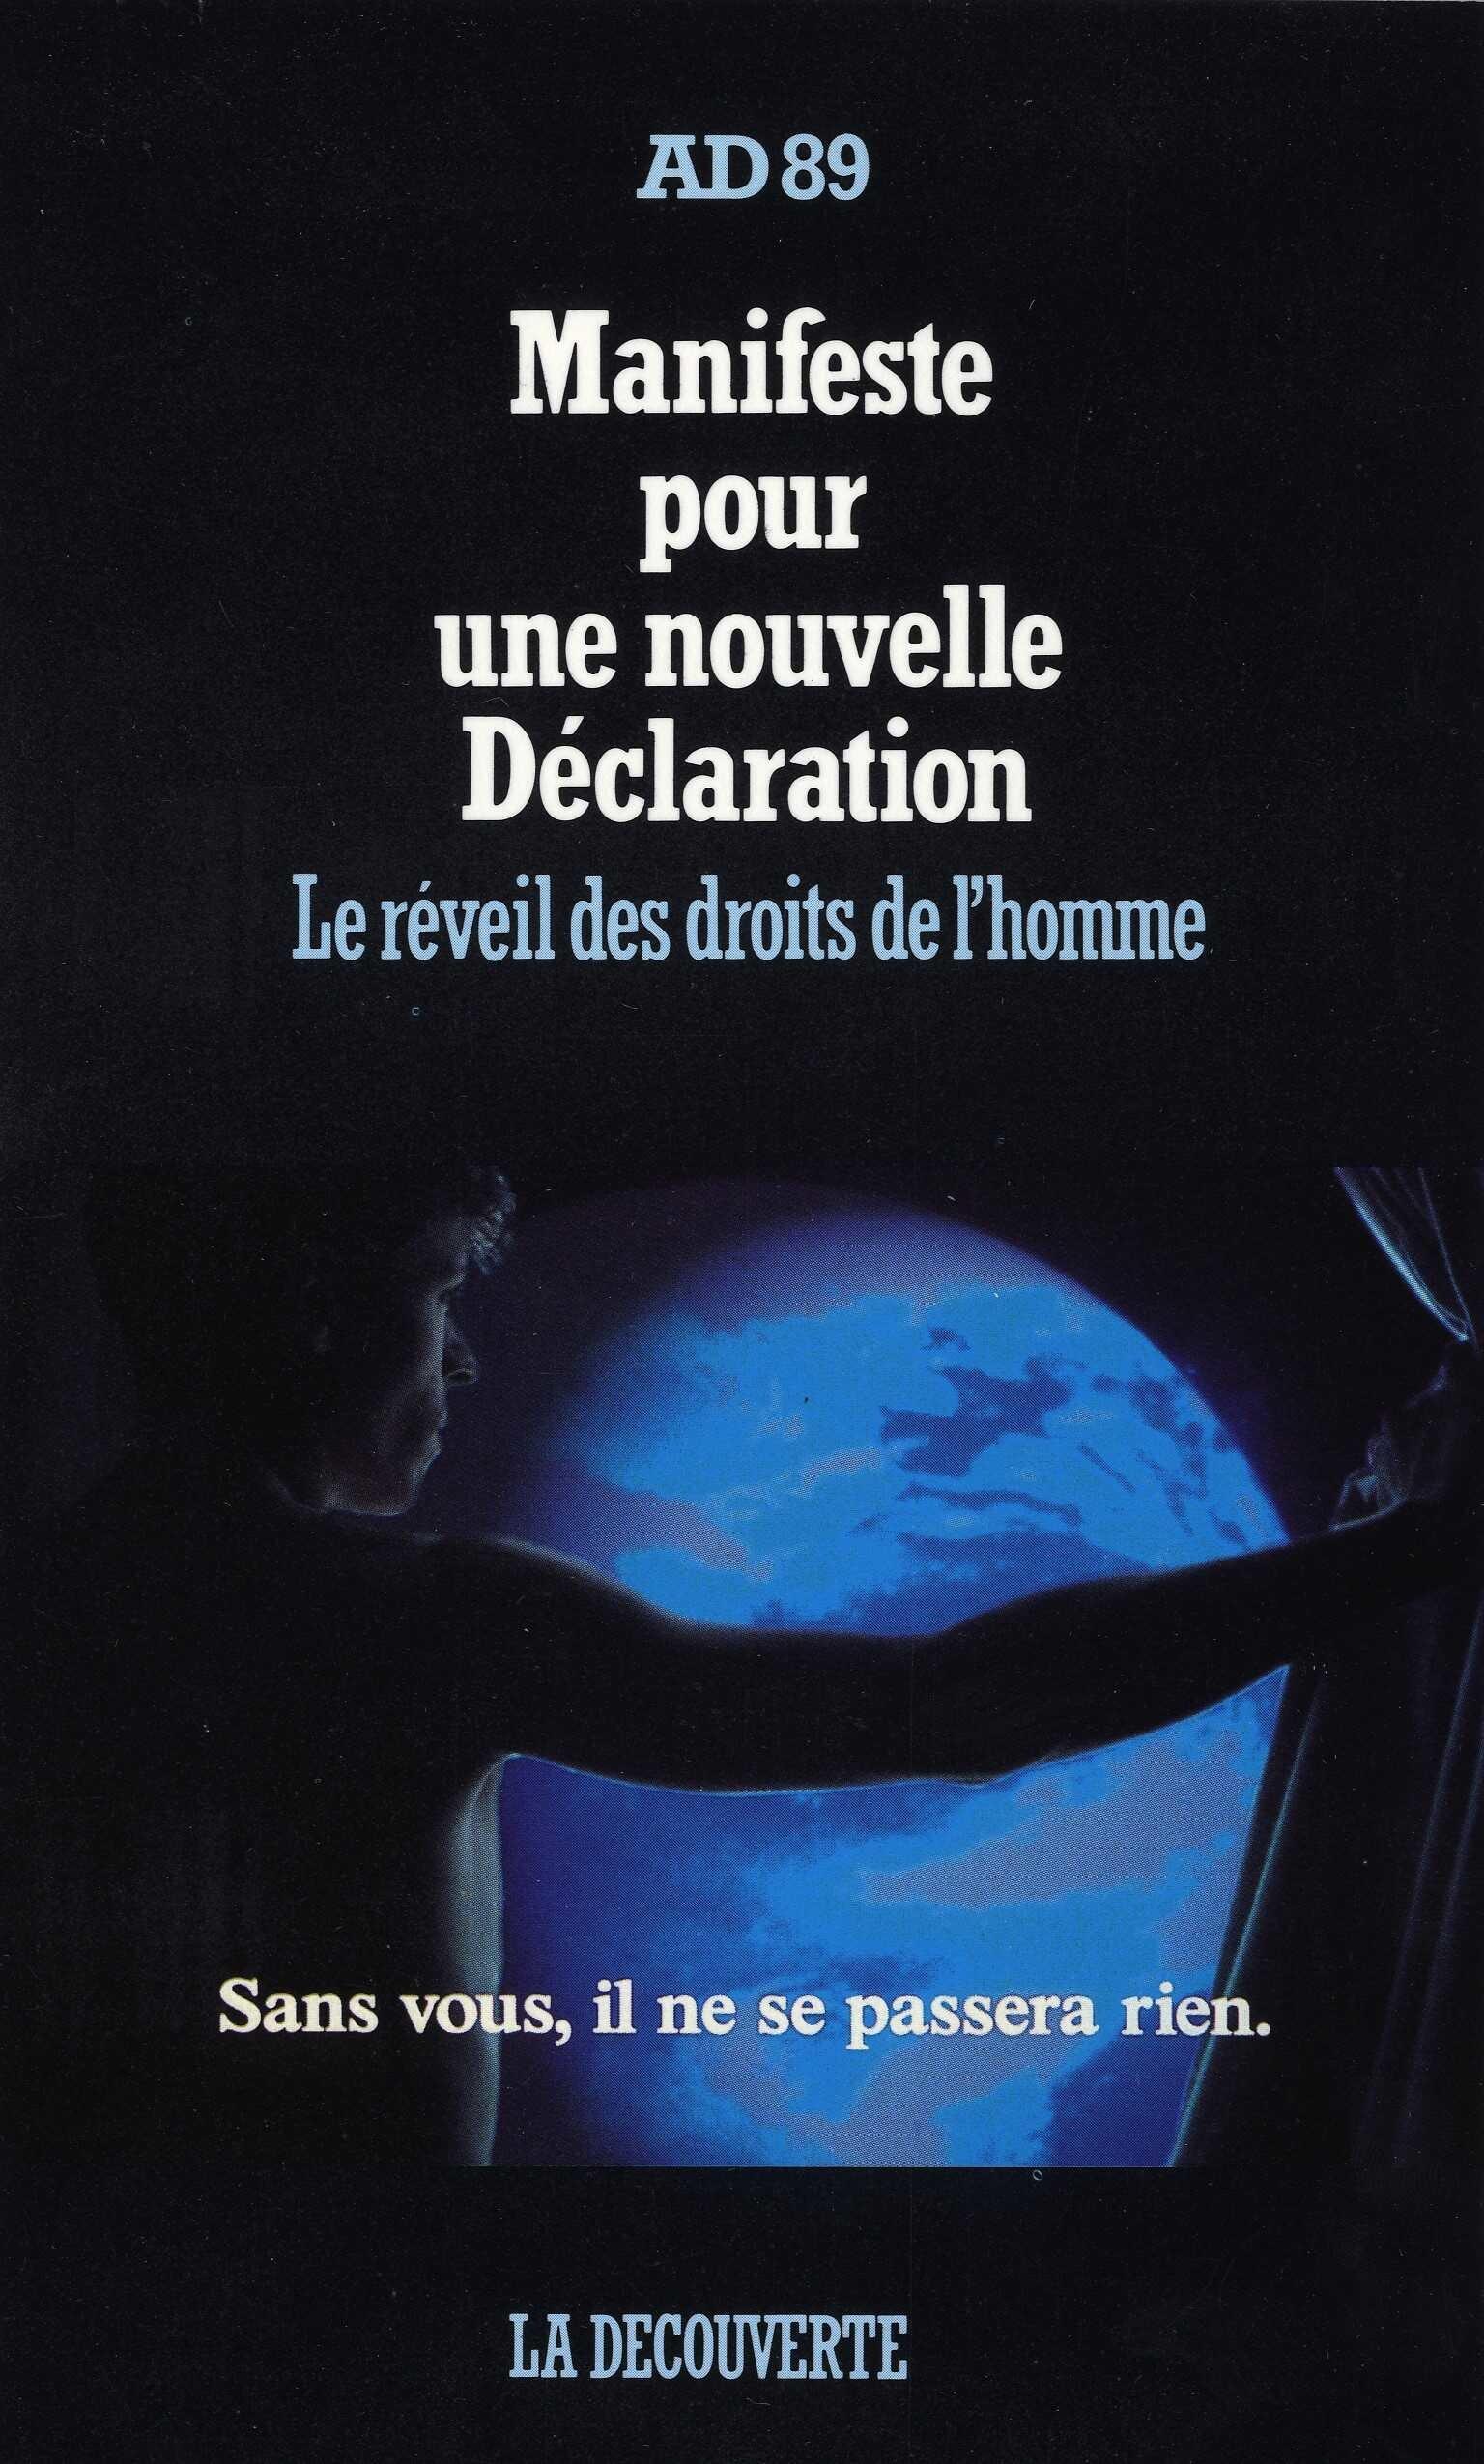 image for La Decouverte